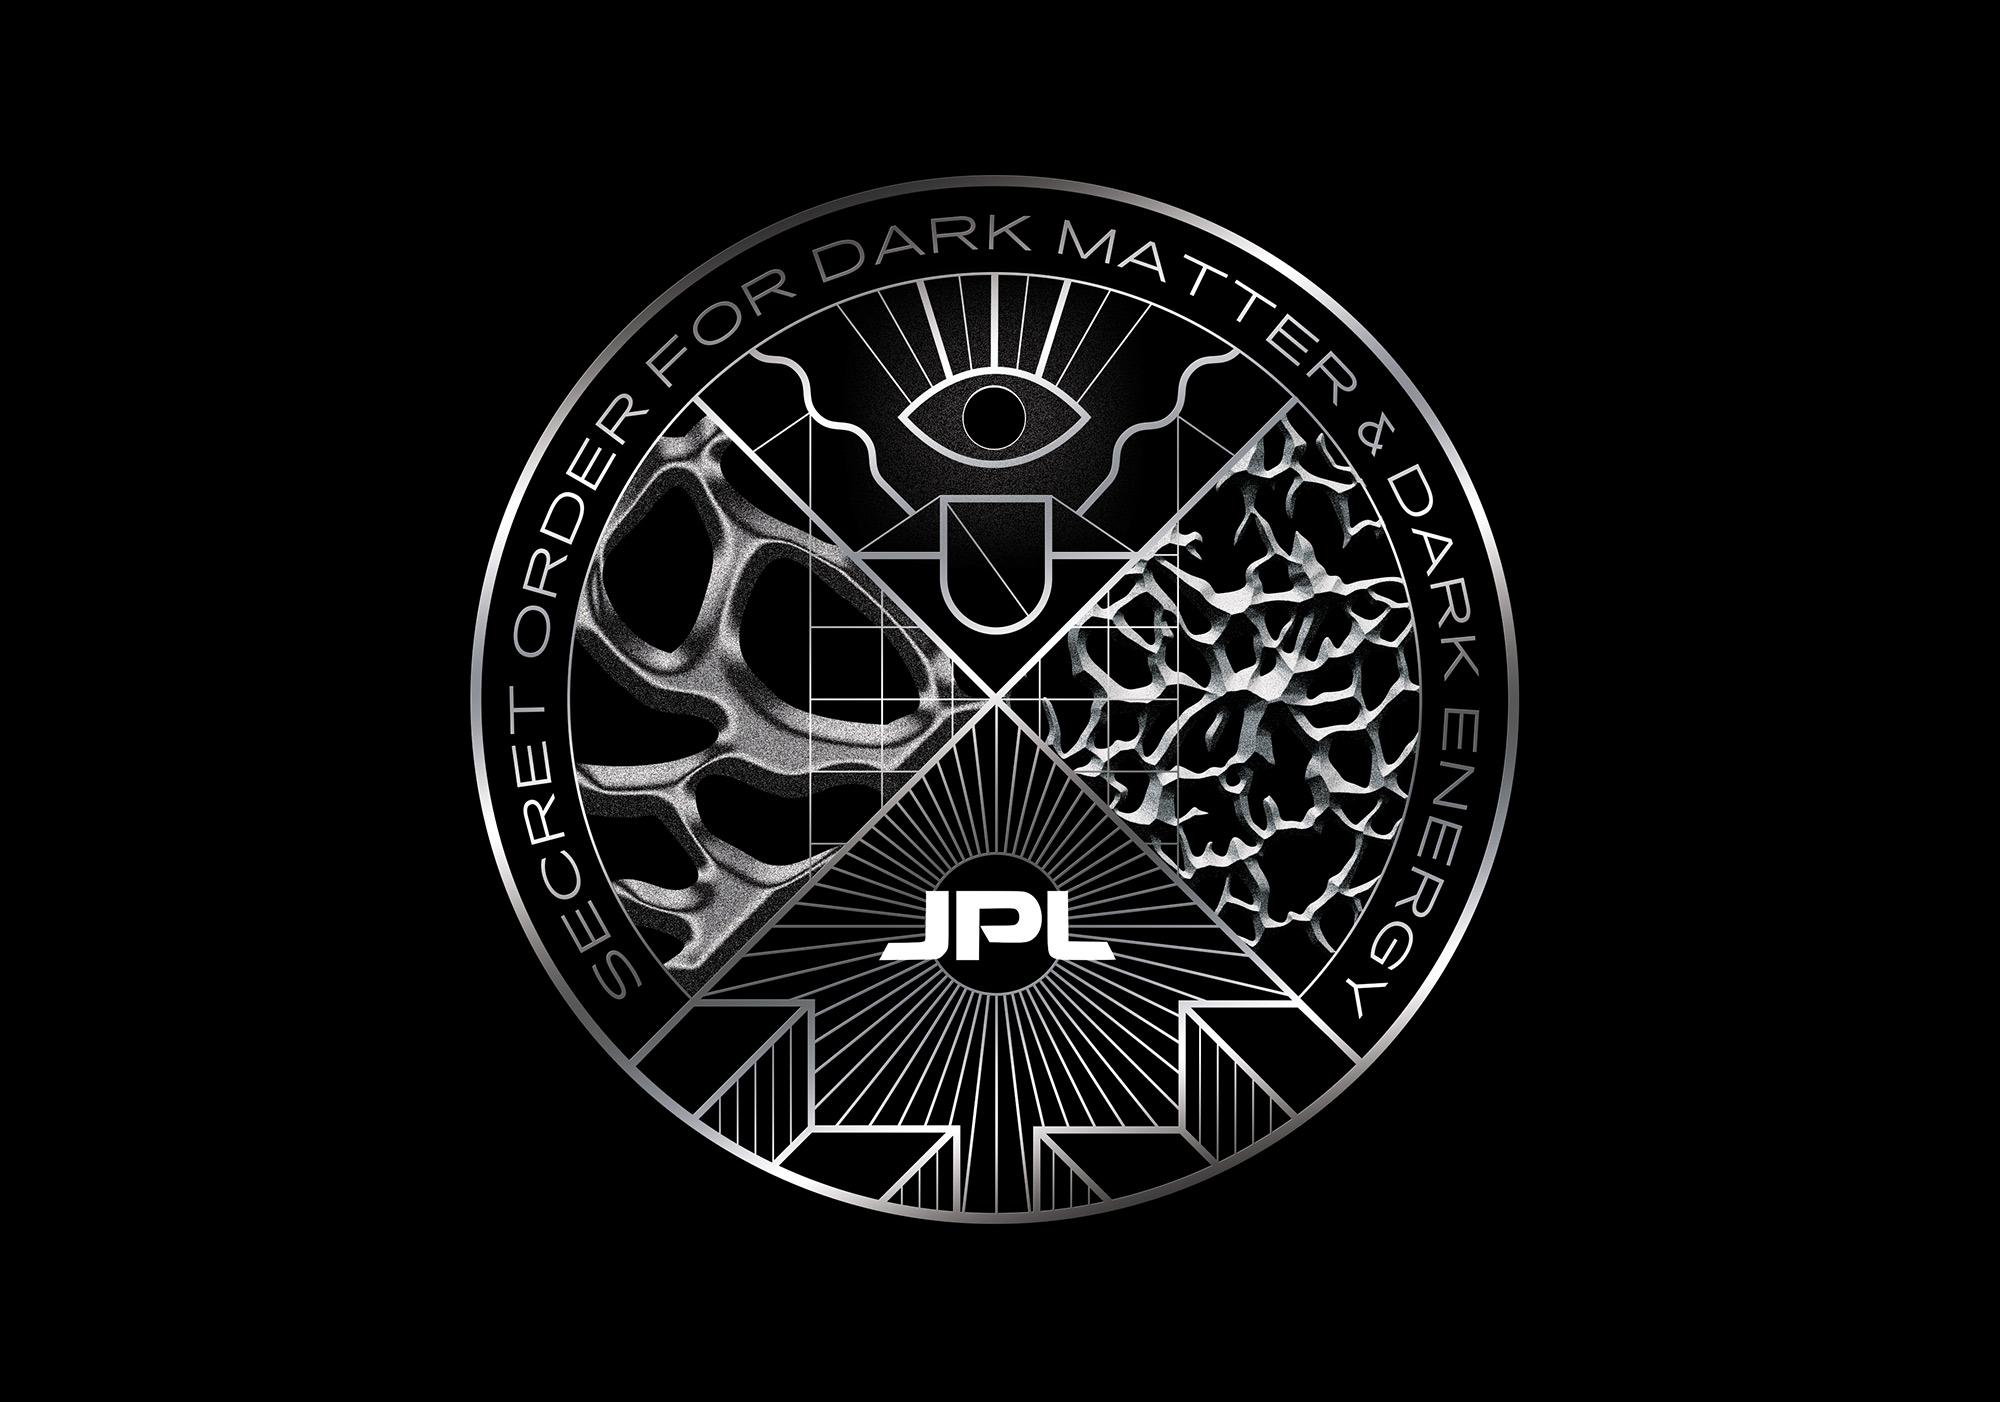 JPL_1